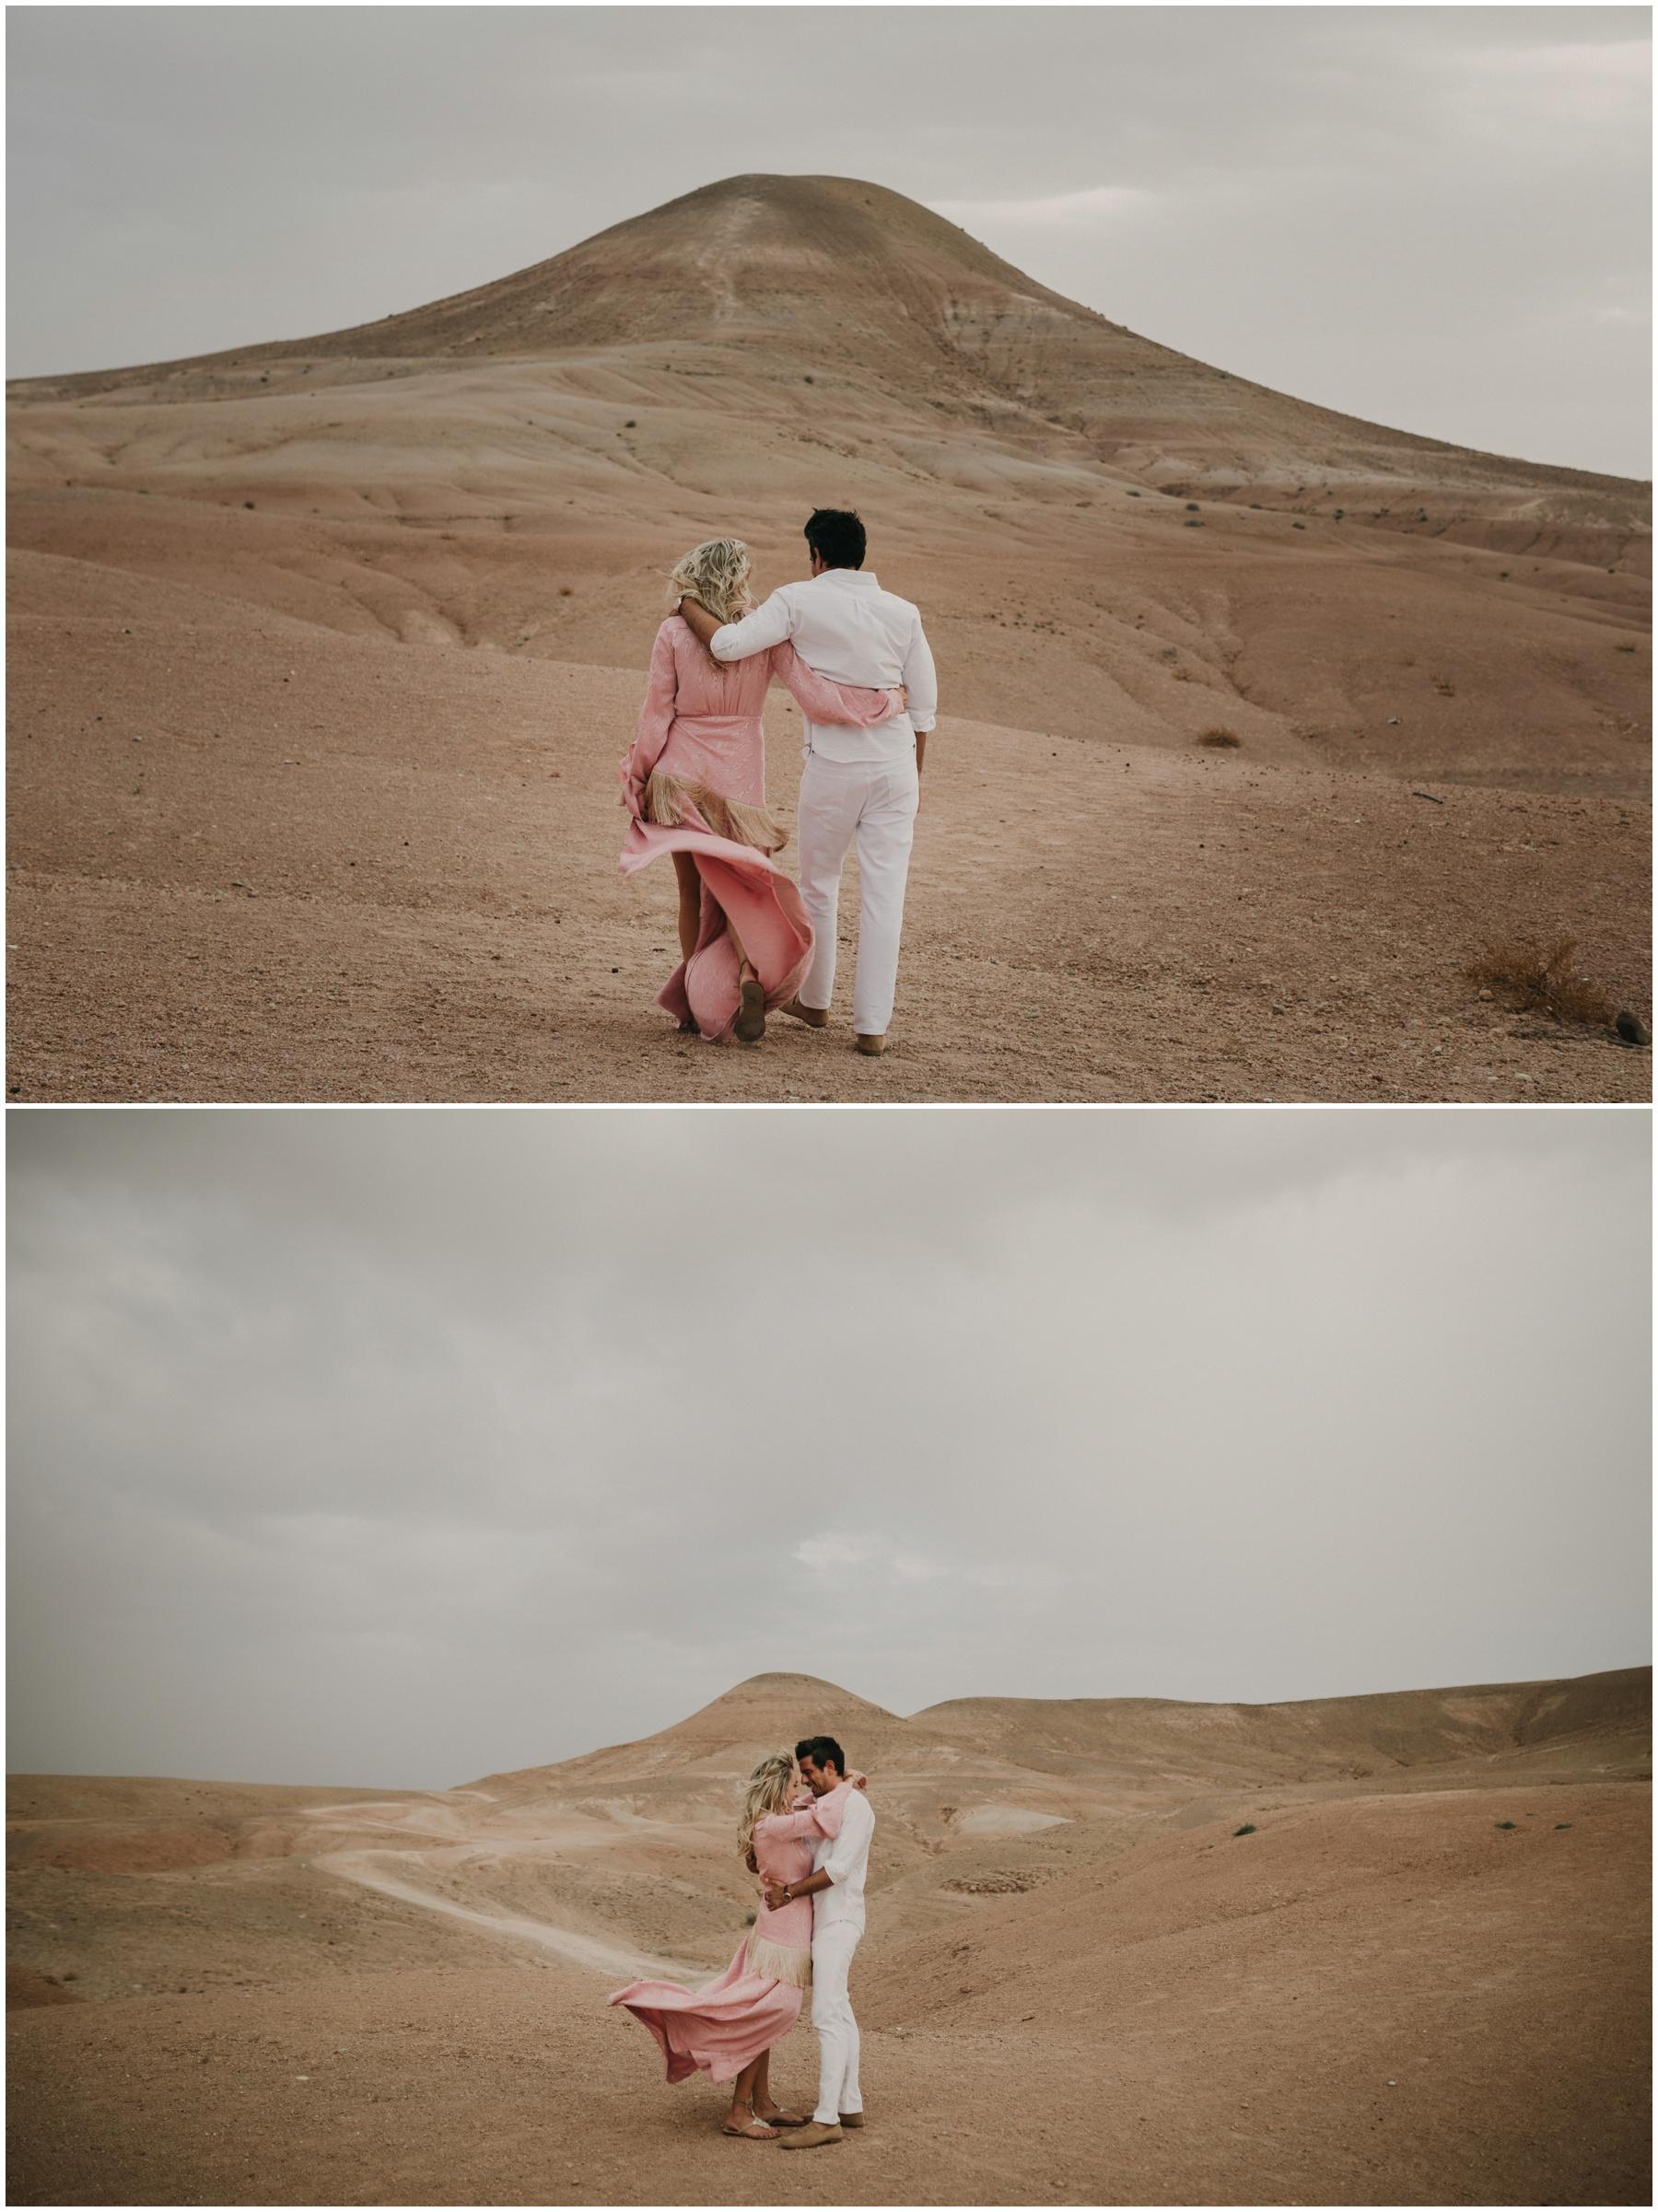 Marrakech Wedding La Pause 006.JPG